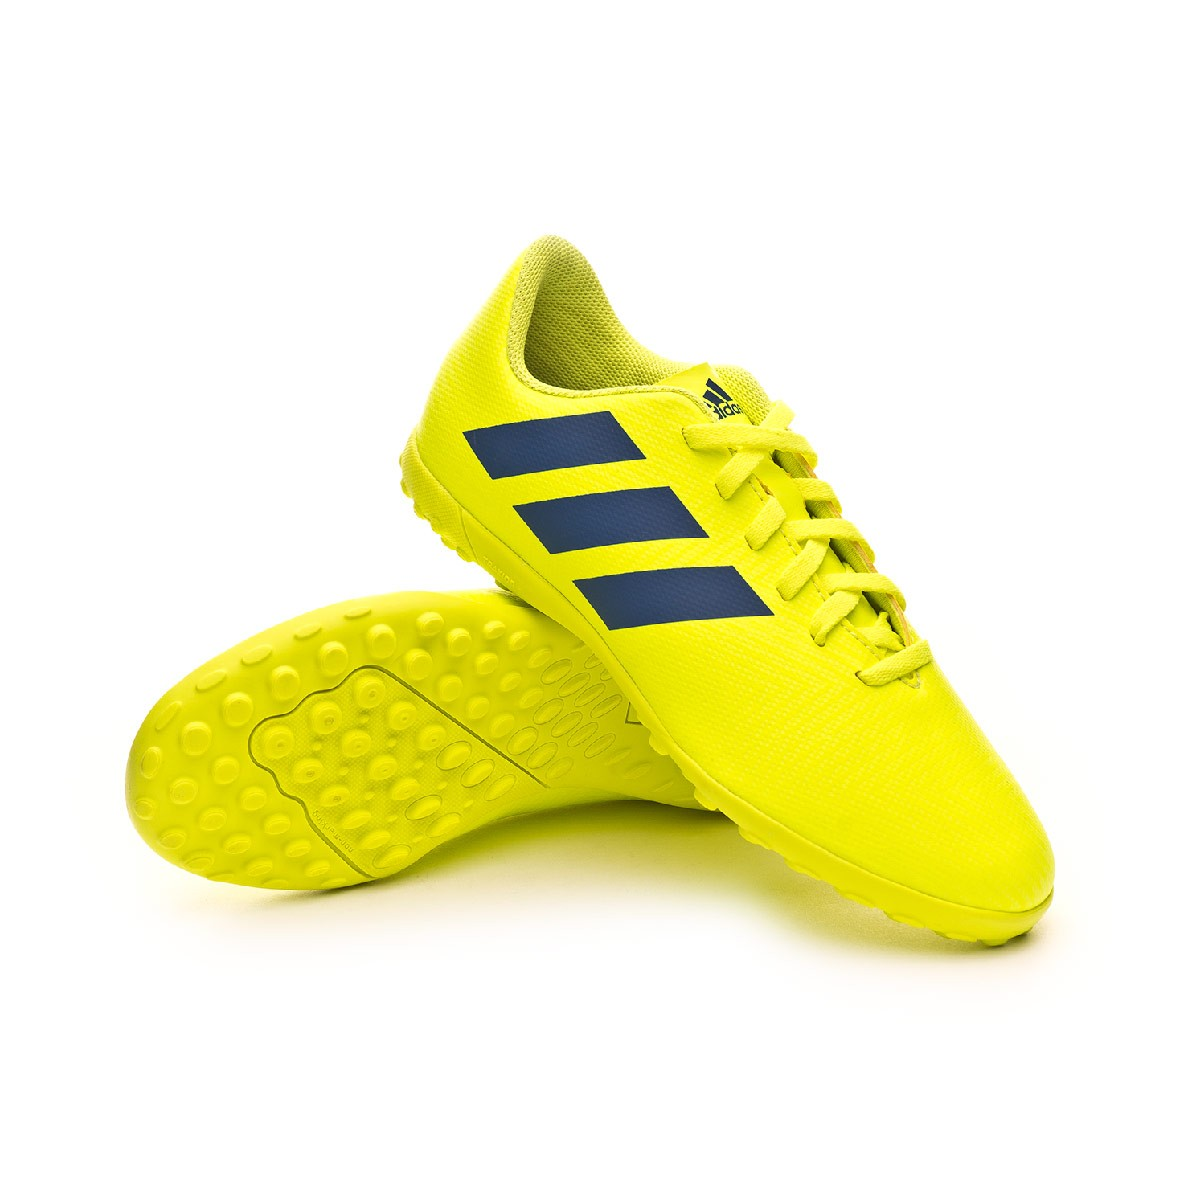 Football Boot adidas Nemeziz 18.4 Turf Niño Solar yellow-Football ... 35947c121b5ea